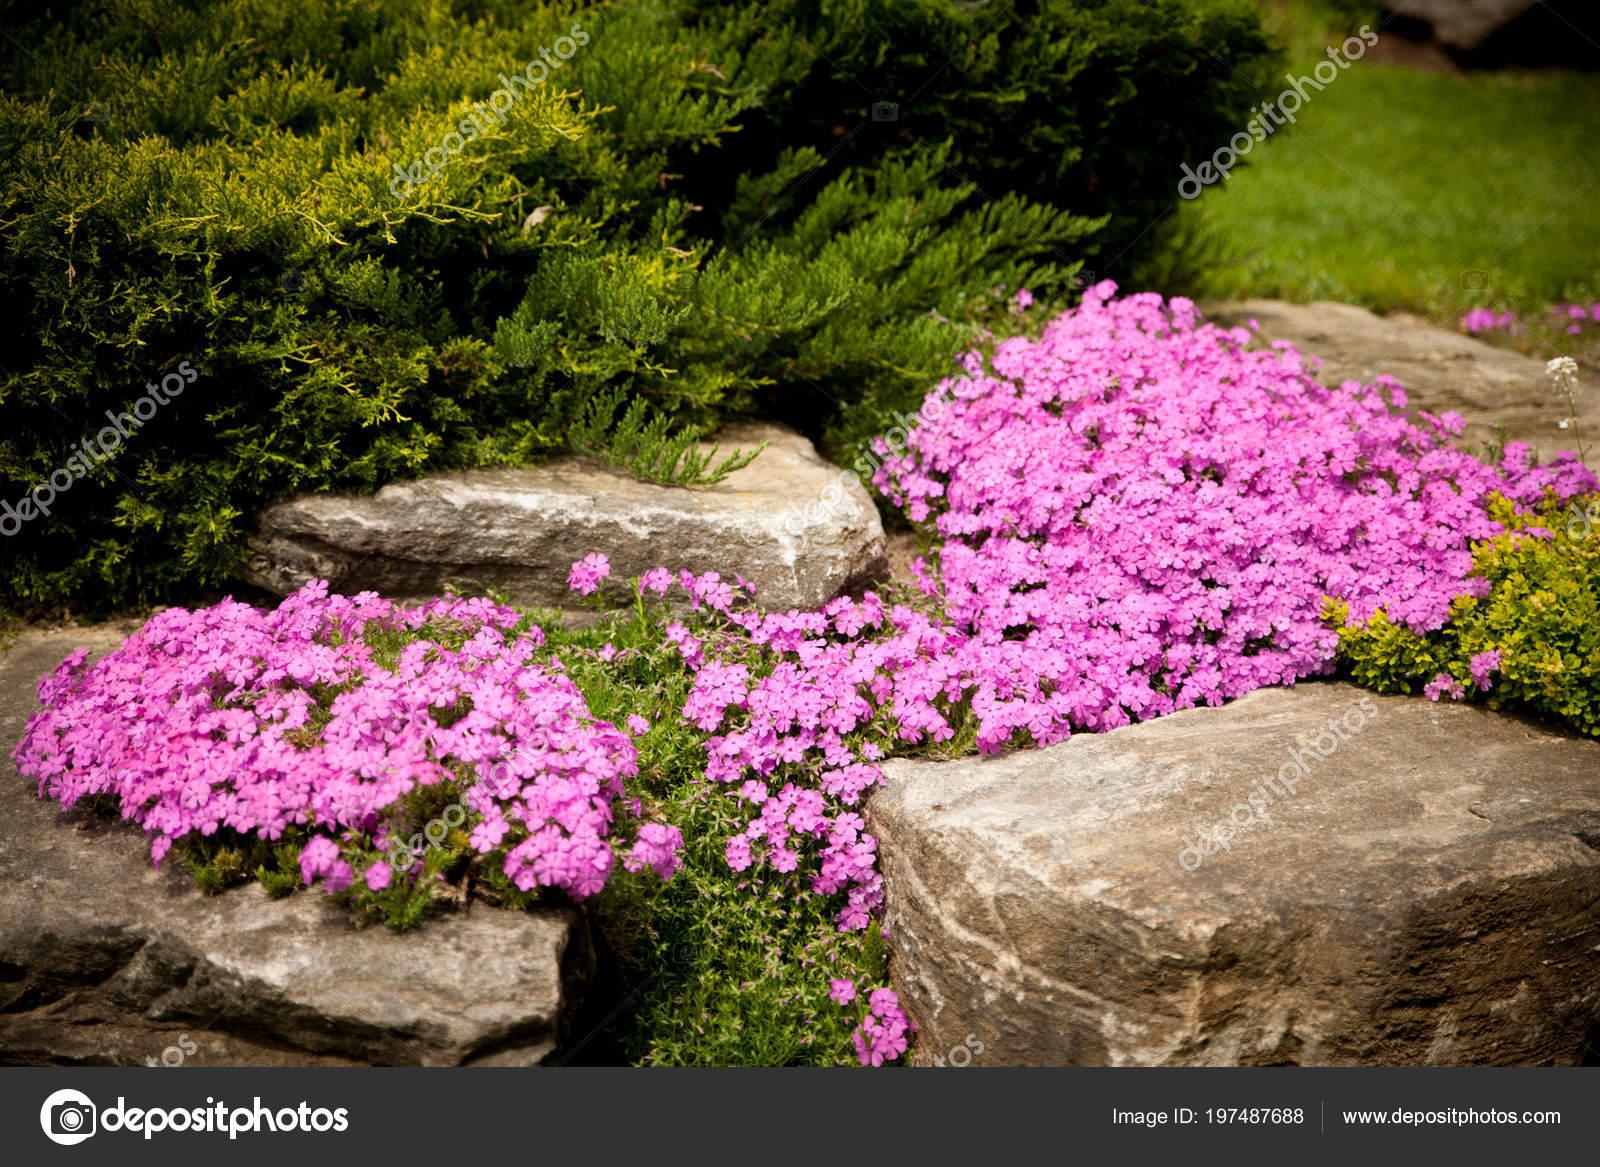 Flowering Rock Garden Spring Different Bushes Flowers Blooming Rock